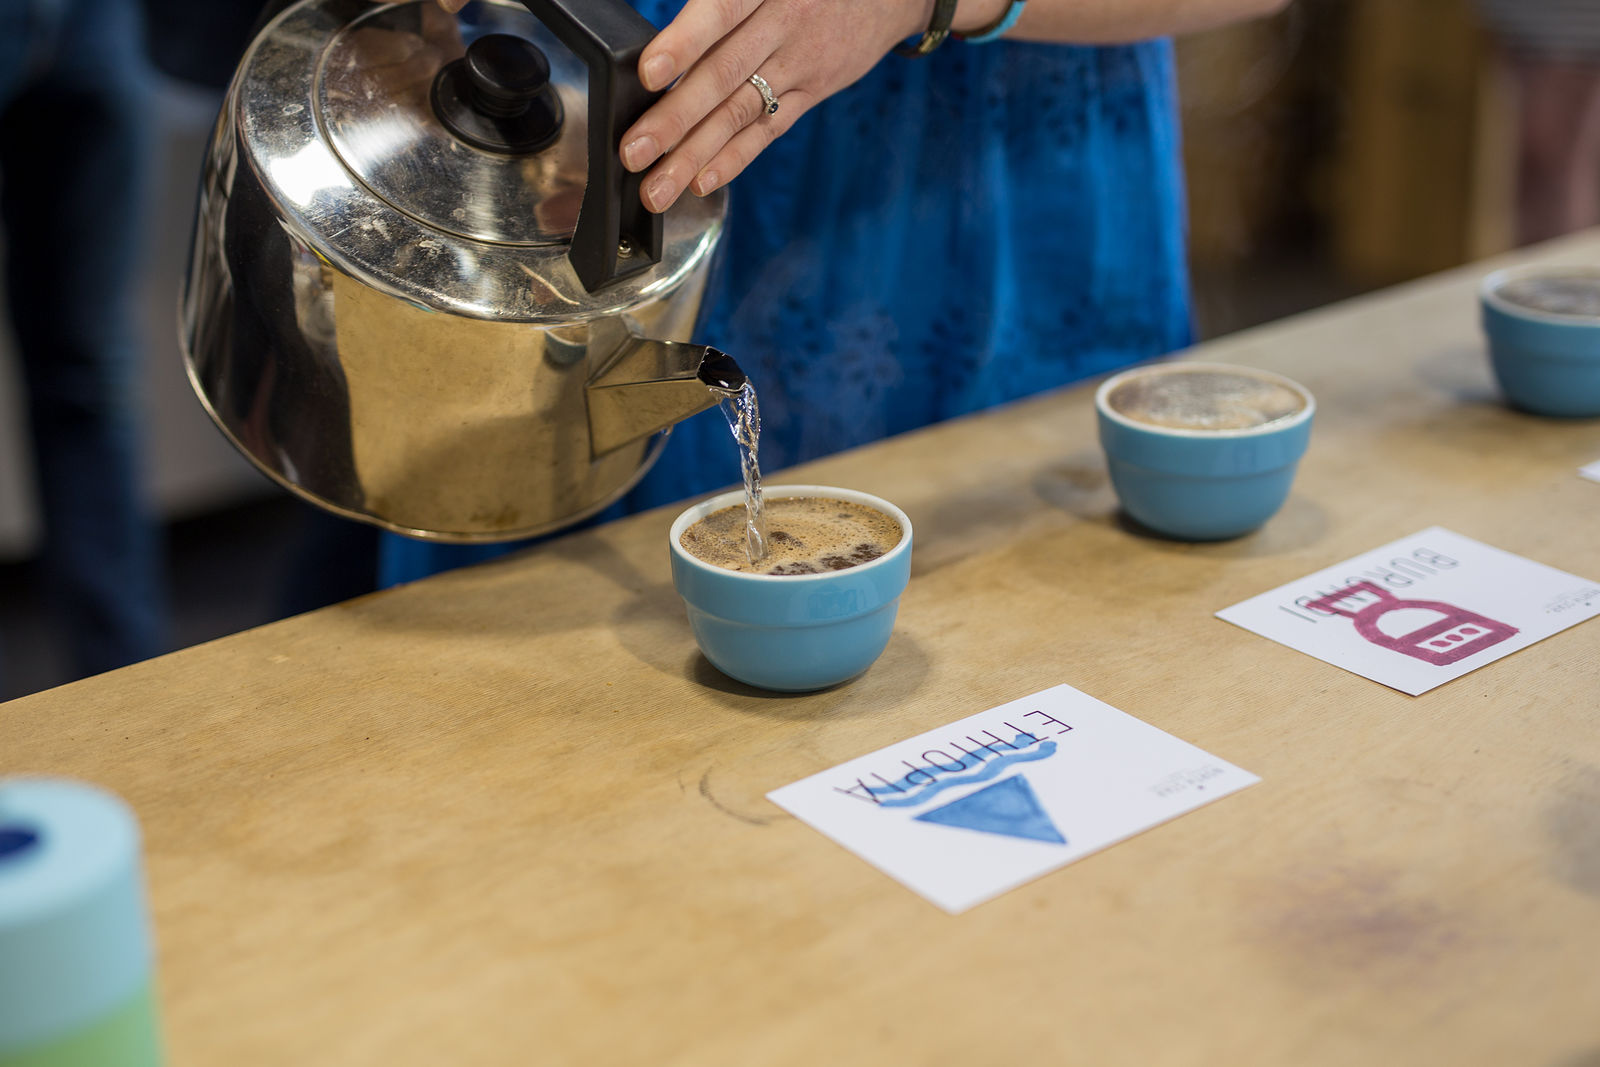 Leeds Indie Food Gallery Coffee Cupping North Star